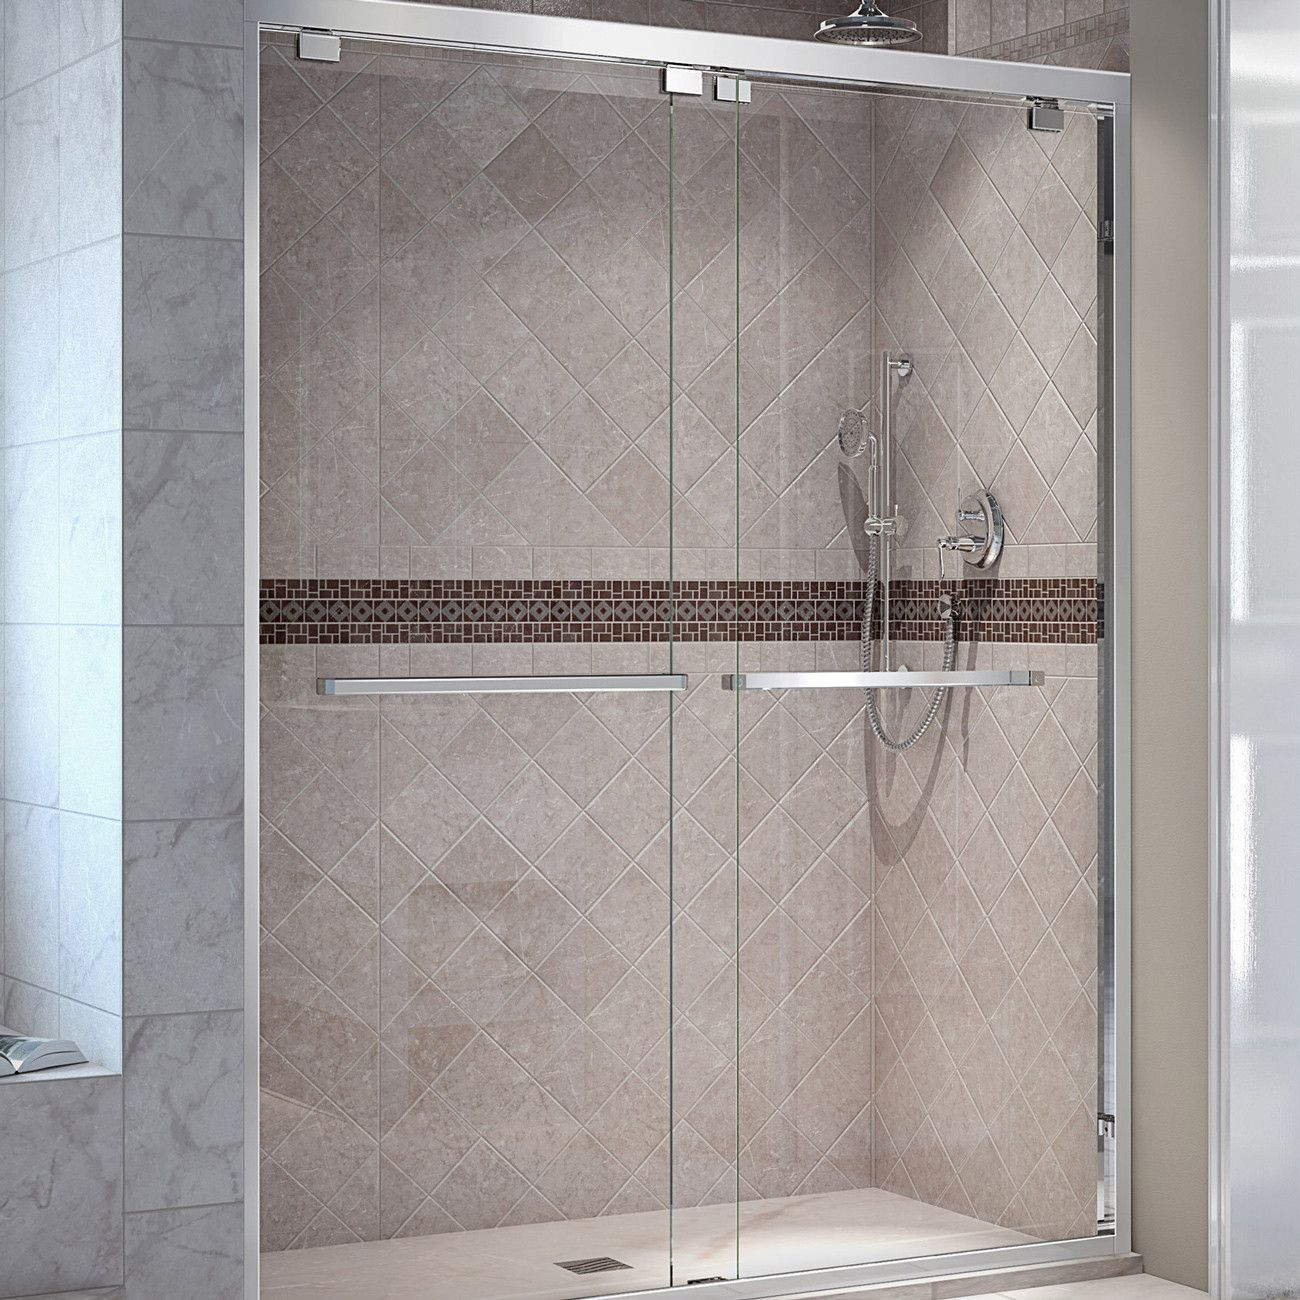 The DreamLine® Encore bypass sliding shower or tub door has a modern ...